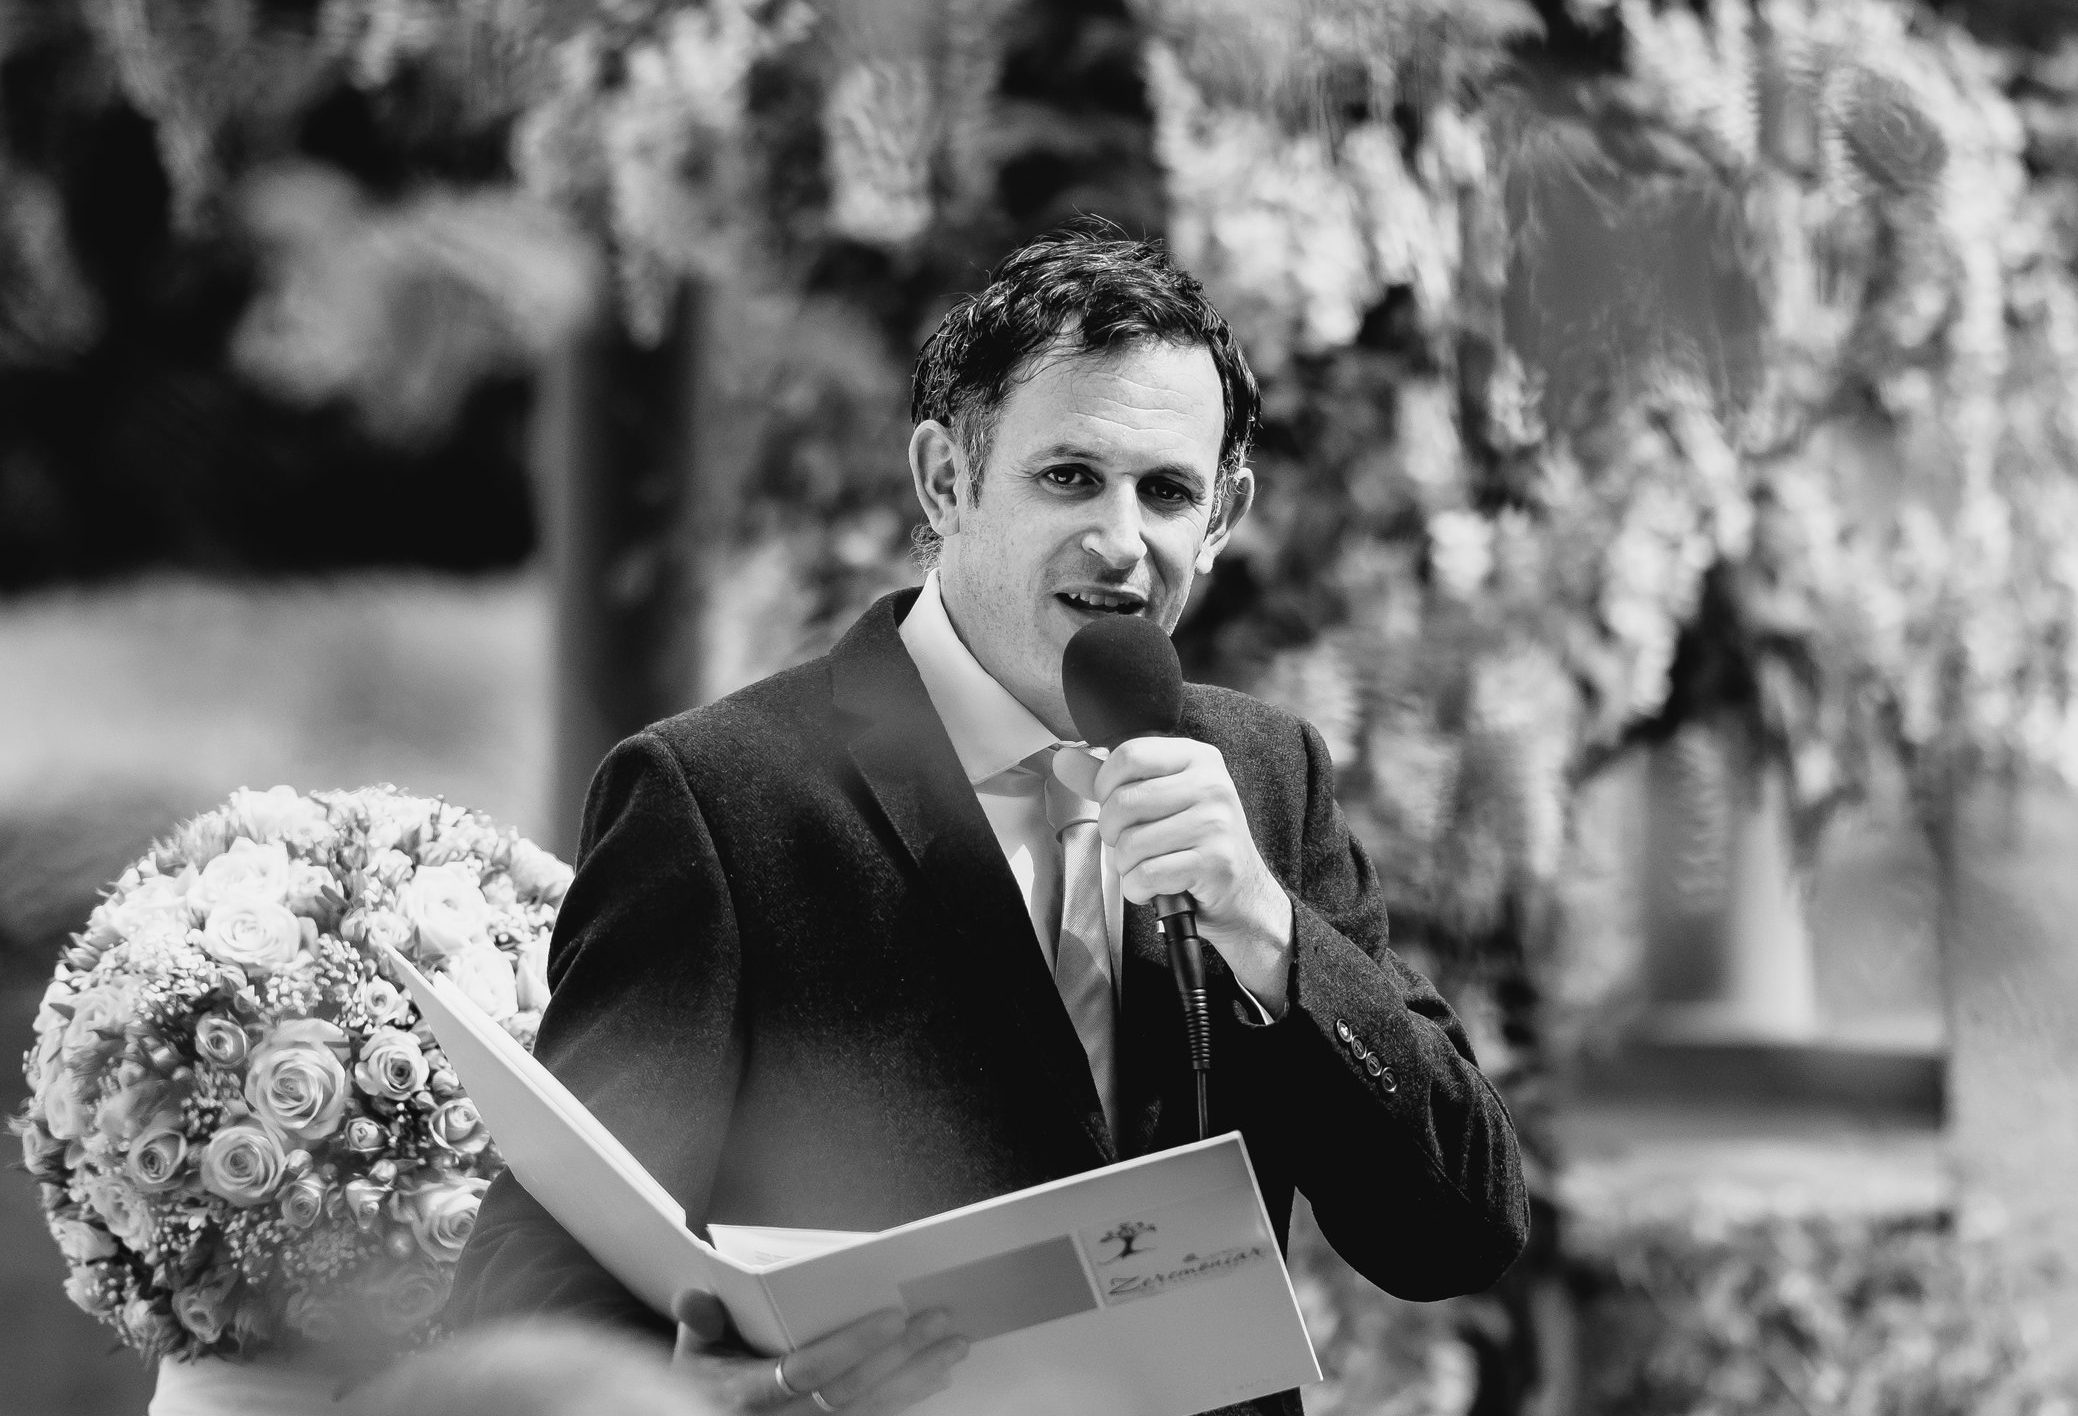 Daniel Stricker redet an Zeremonie sw.jpg